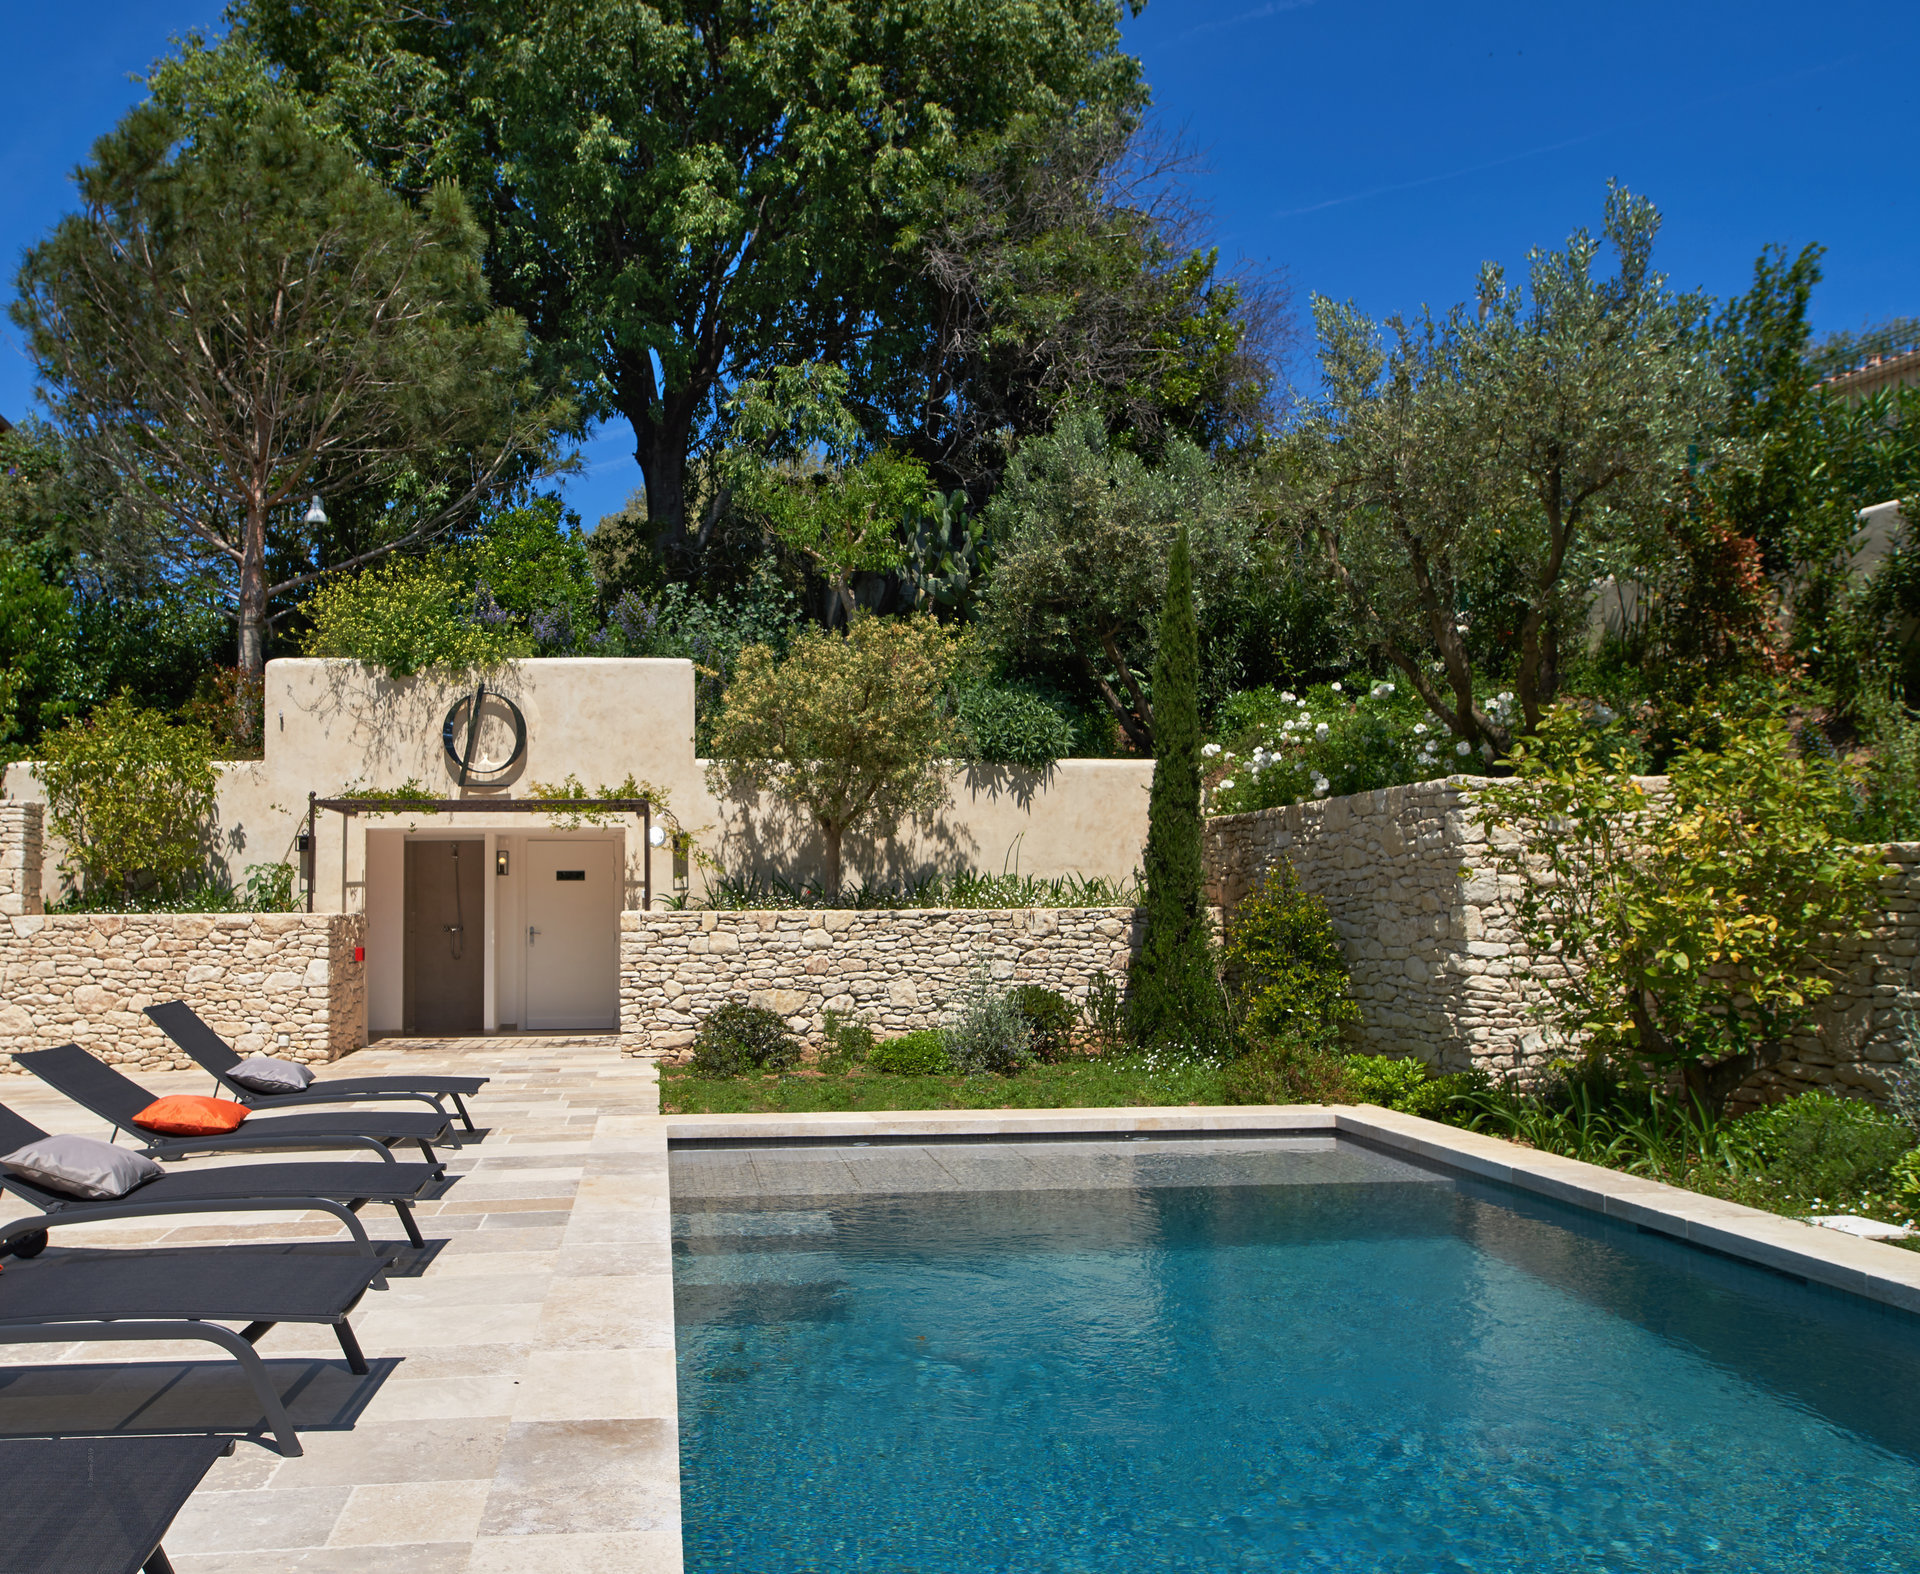 Cap d'Antibes -  « Les oliviers » Quality, élégance and exclusivity